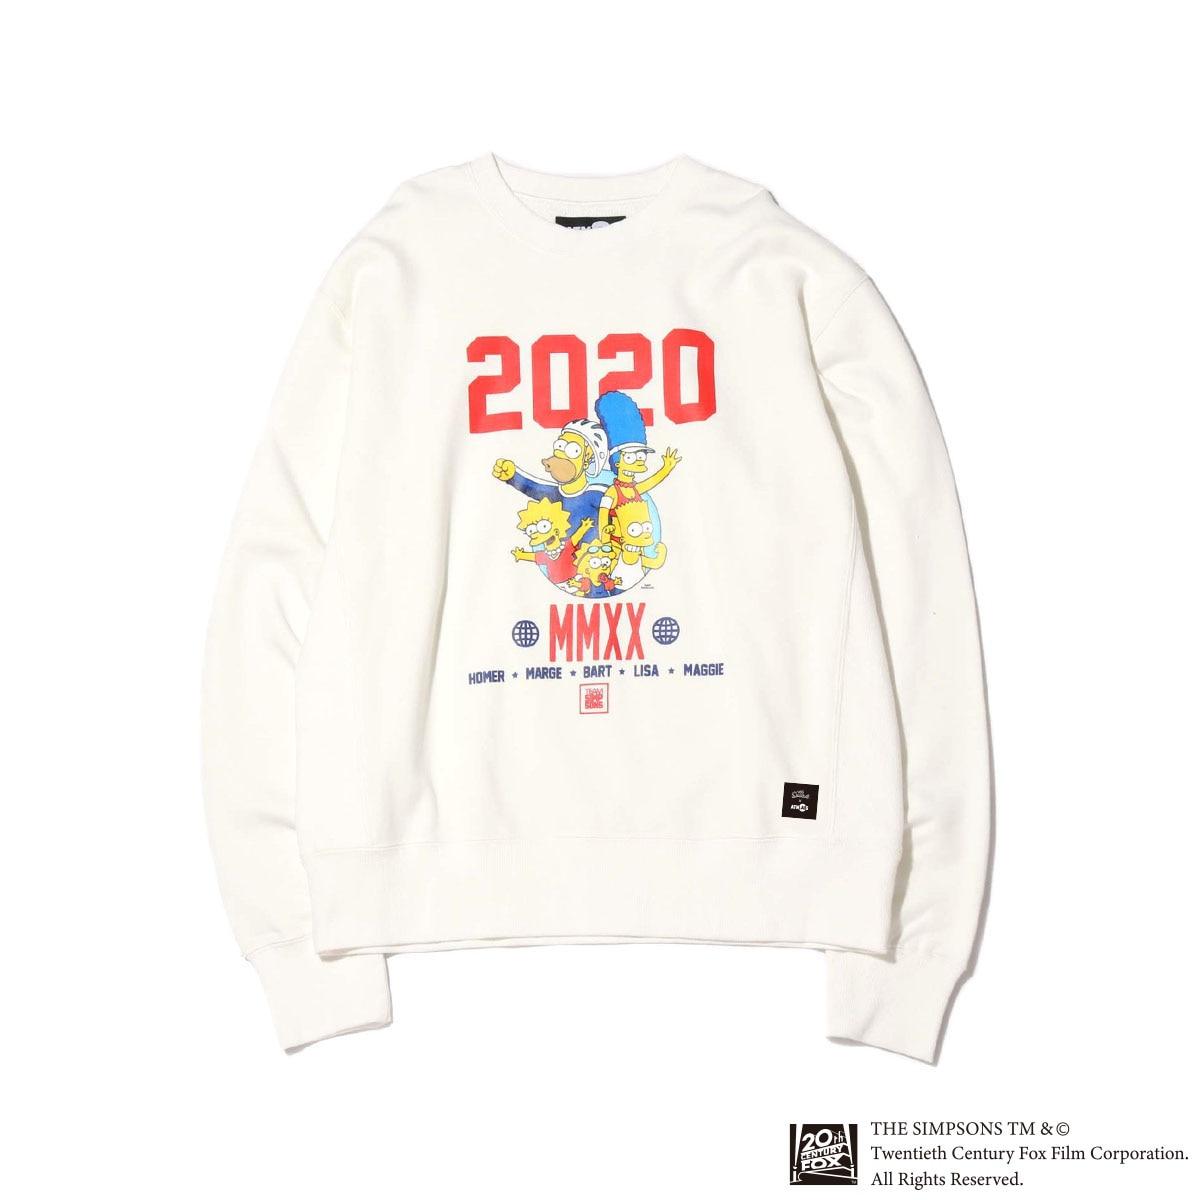 ATMOS LAB x THE SIMPSONS 2020 FAMILY CREW(WHITE)(アトモスラボ ザ シンプソンズ 2020 ファミリー クルー)【メンズ】【スウェット】【20SP-S】